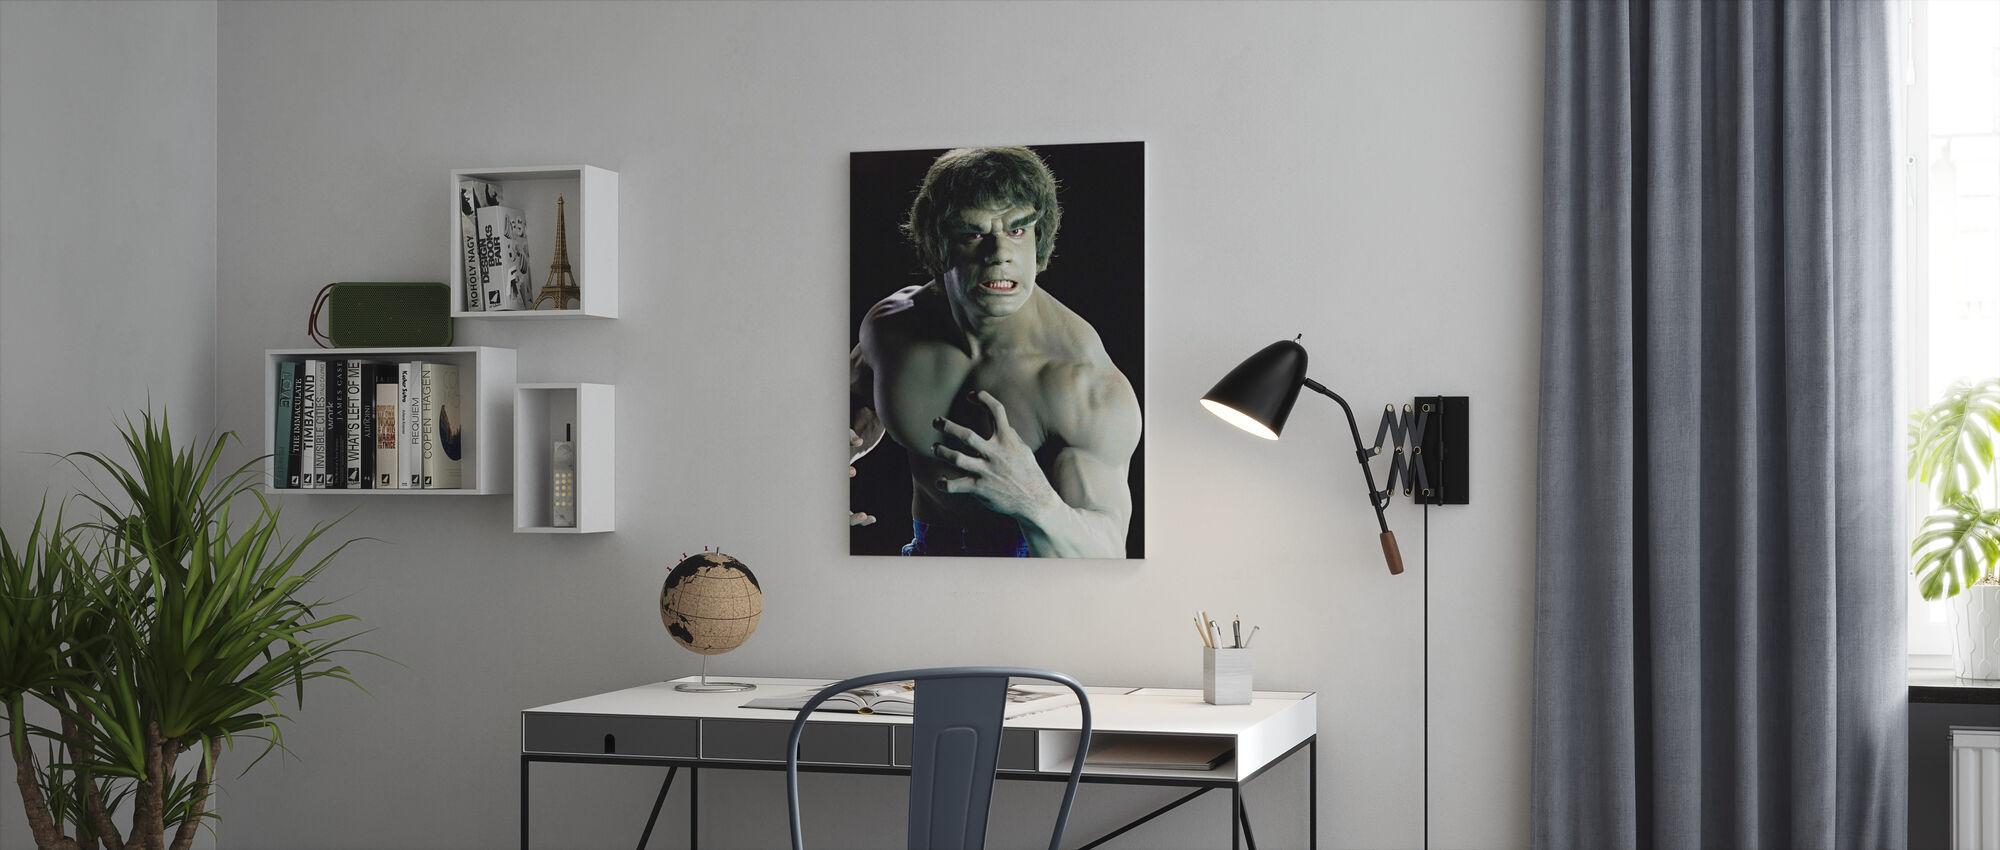 Incredible Hulk the TV - Canvas print - Office